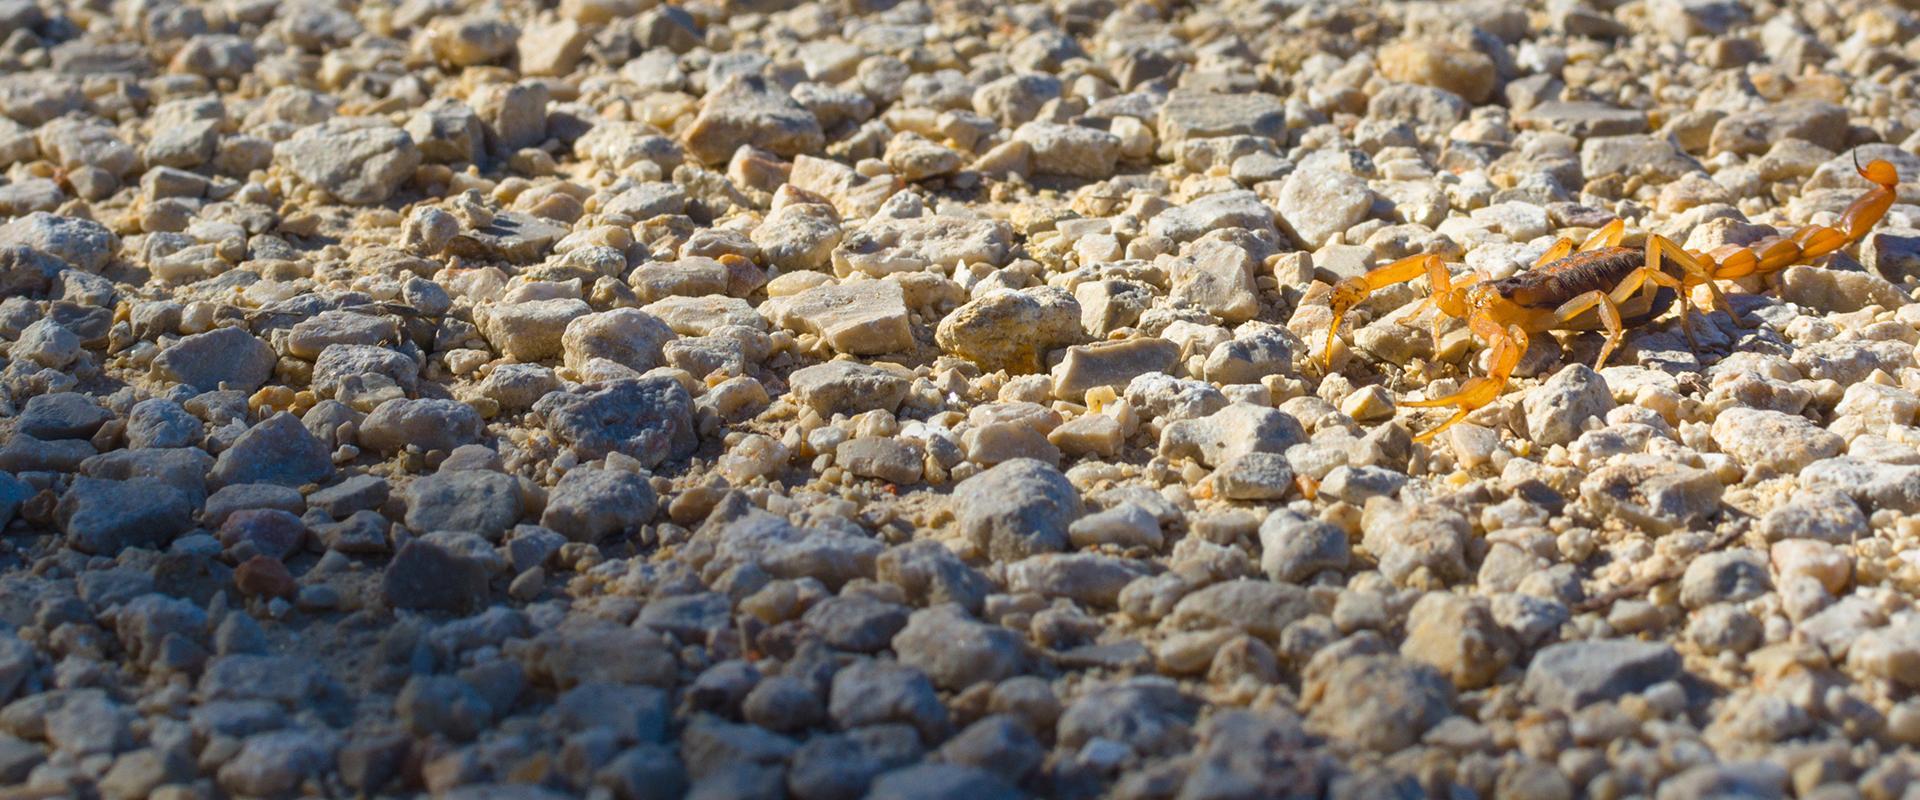 scorpion on rocky ground